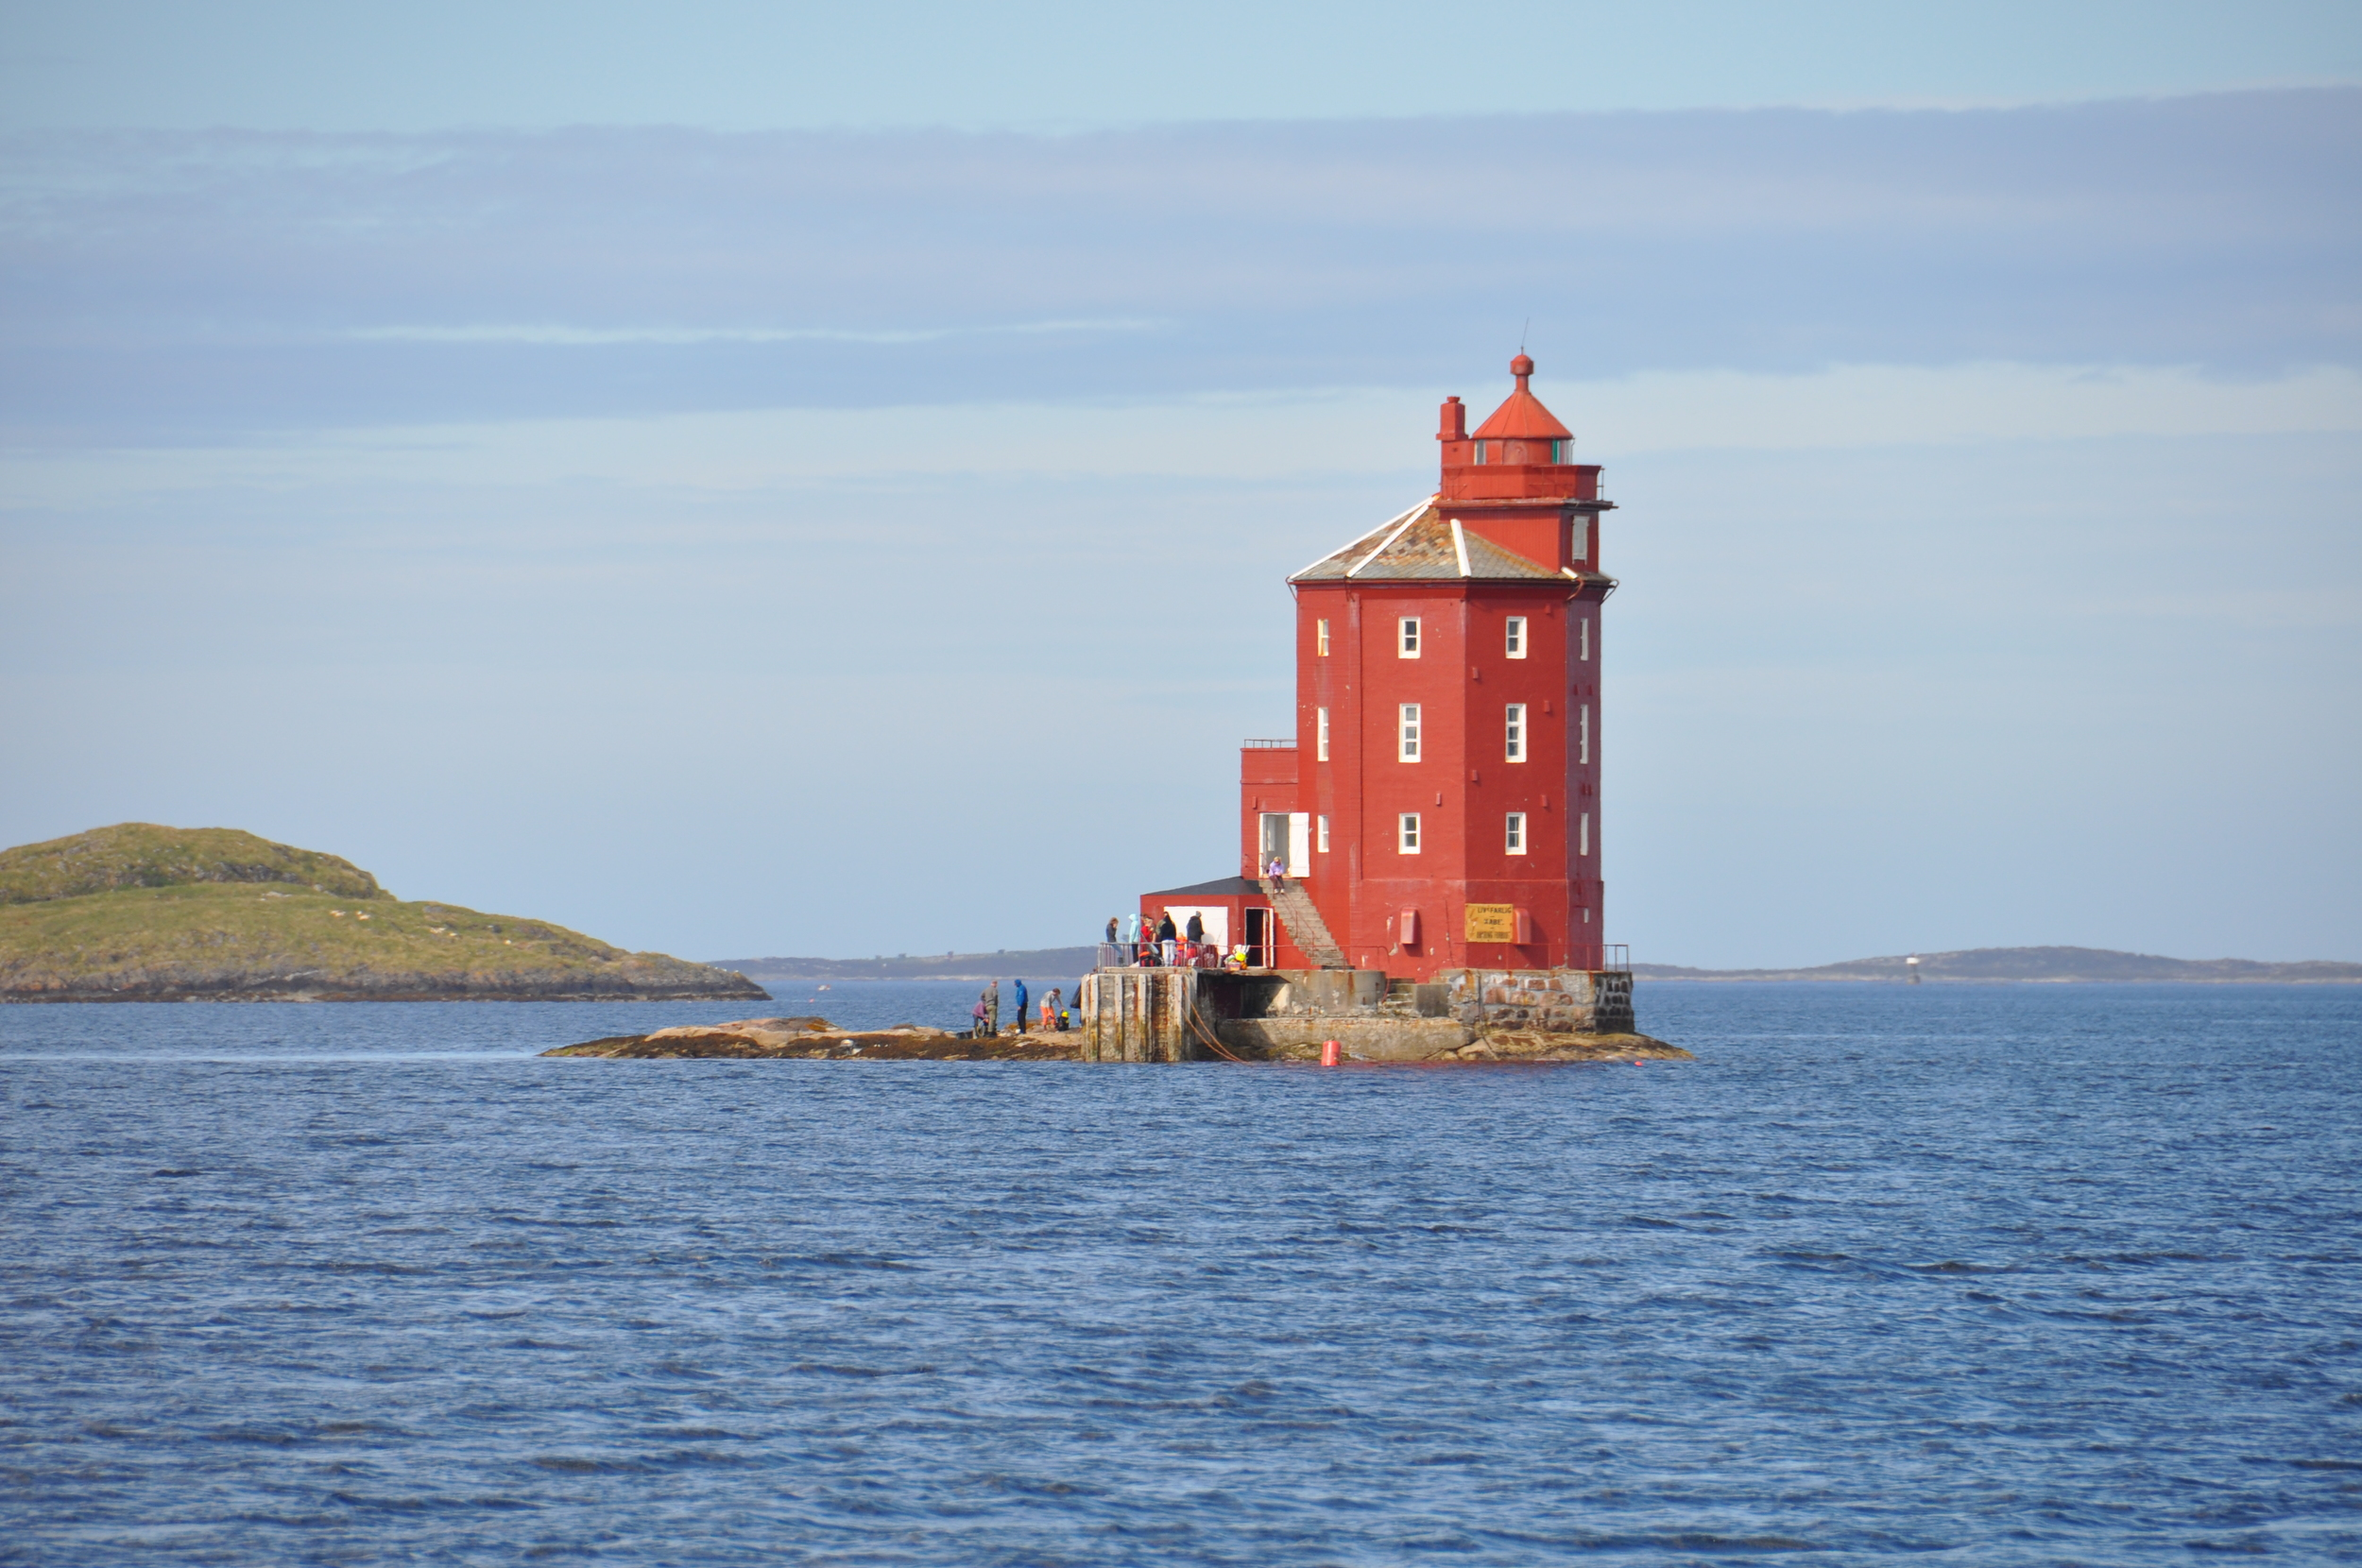 Kjeungskjær lighthouse.